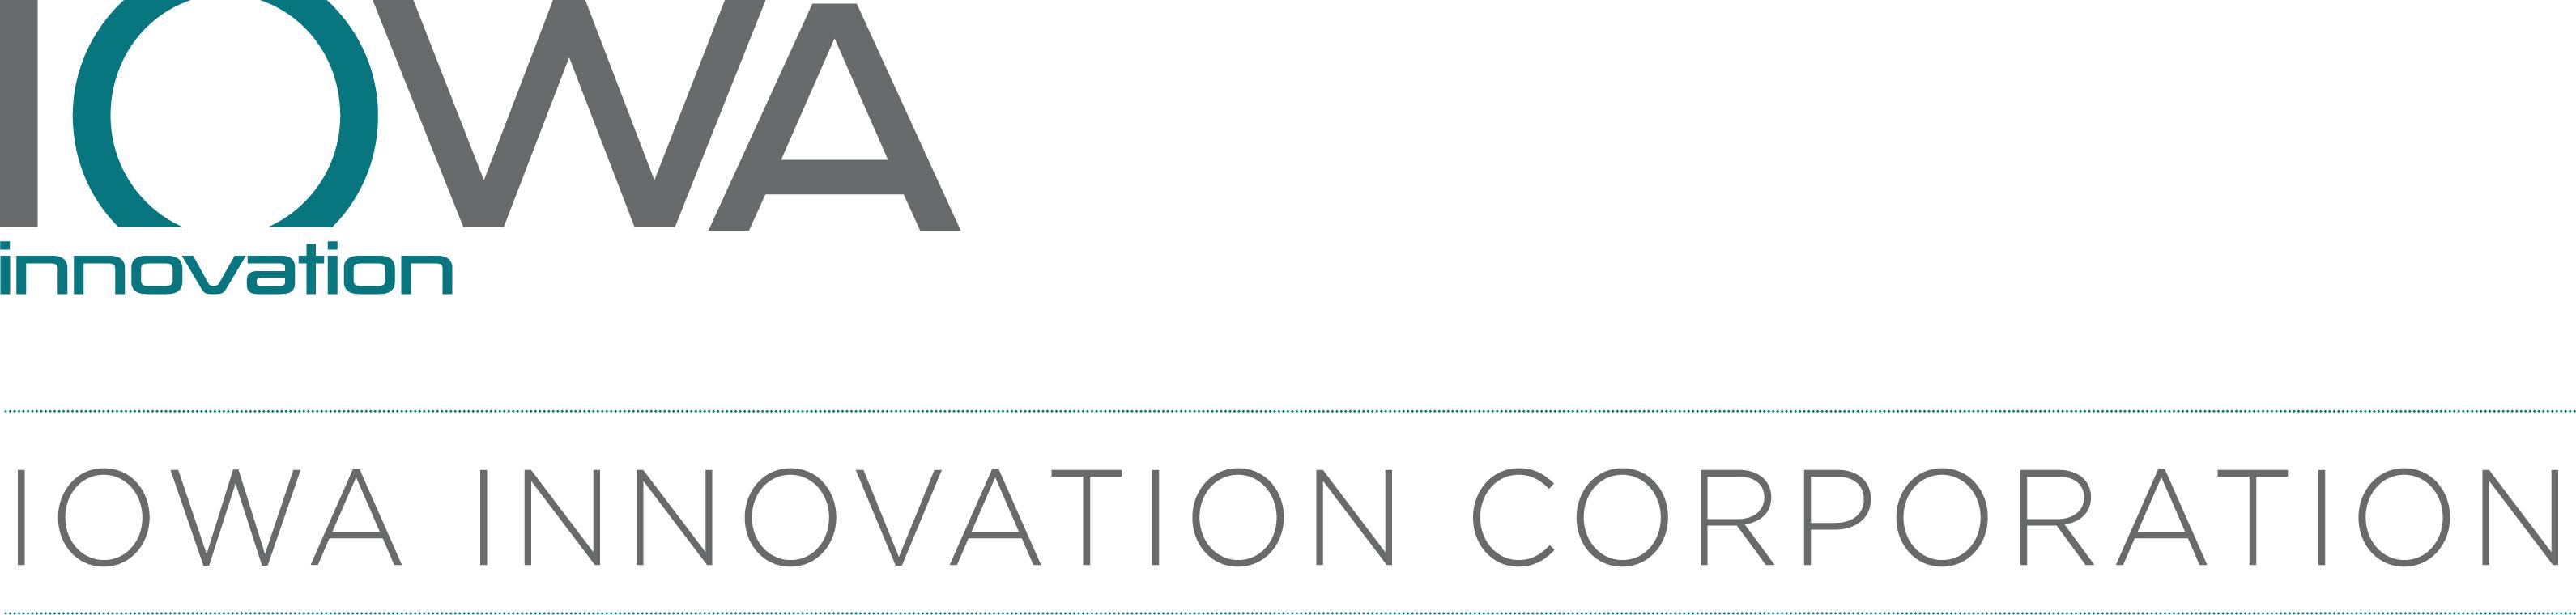 Iowa Innovation Corporation